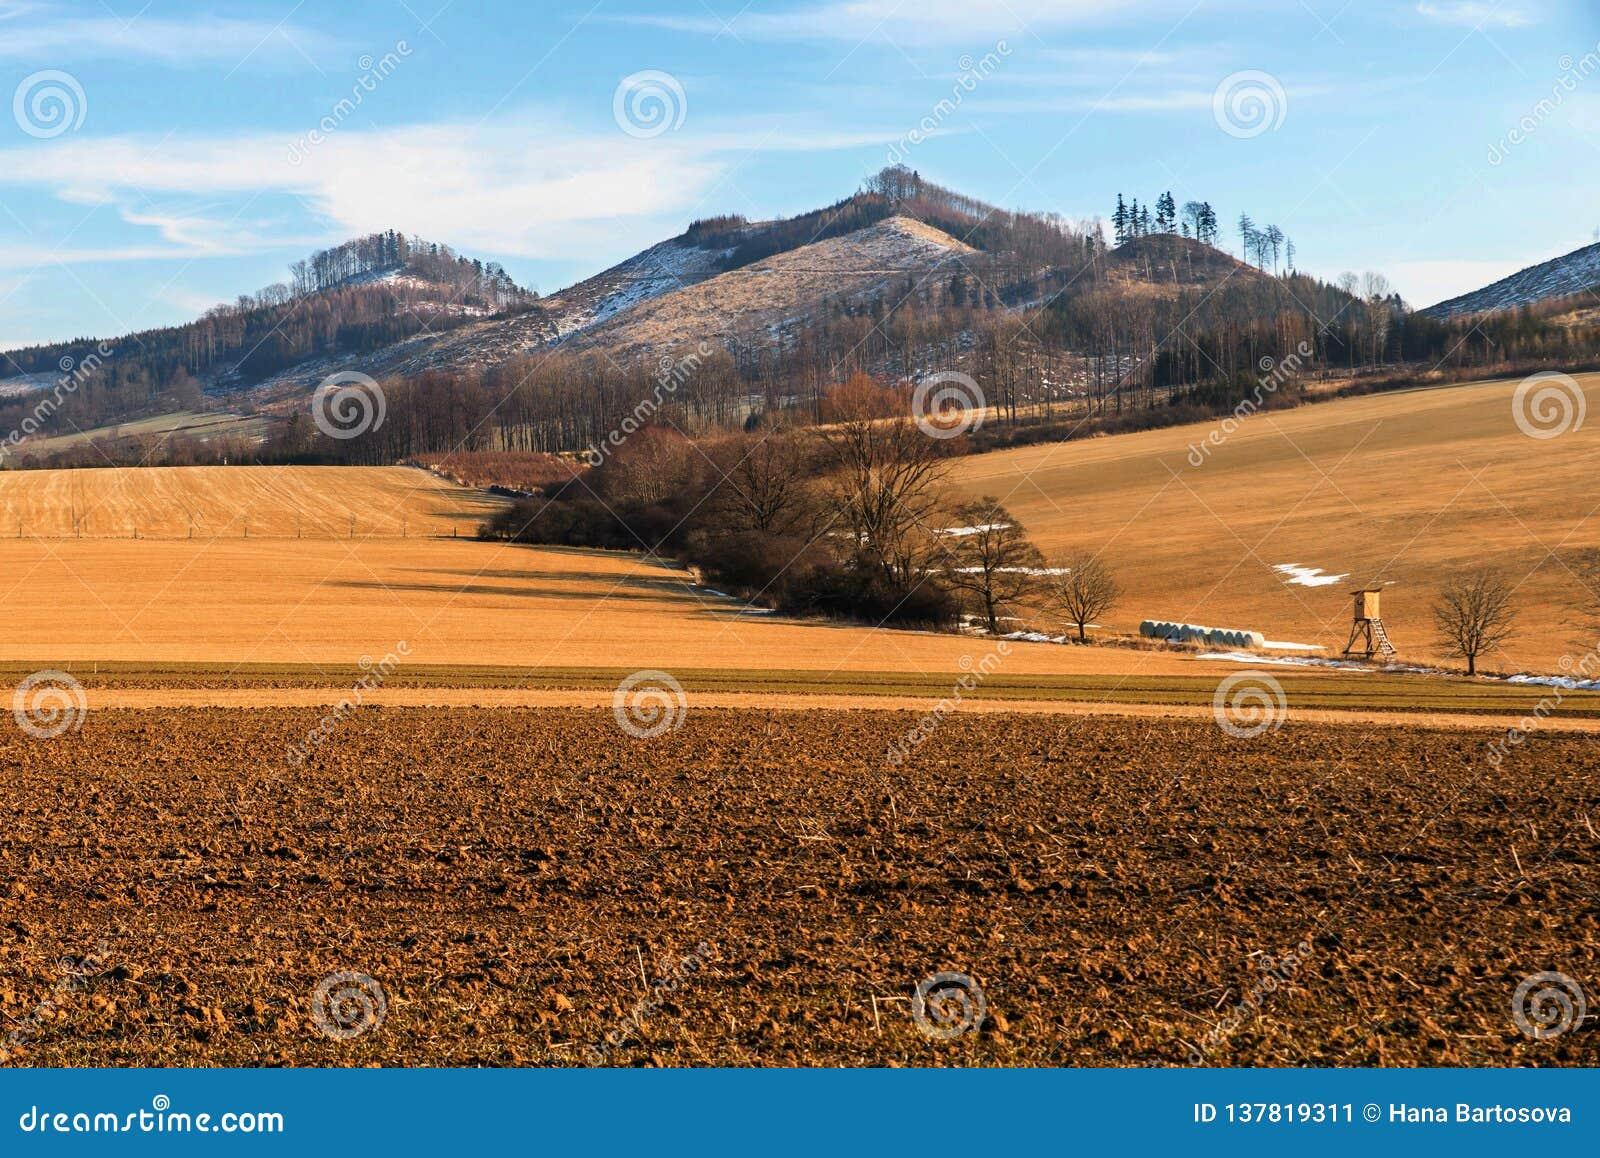 Hills and fields near Podhradni Lhota, Czech republic